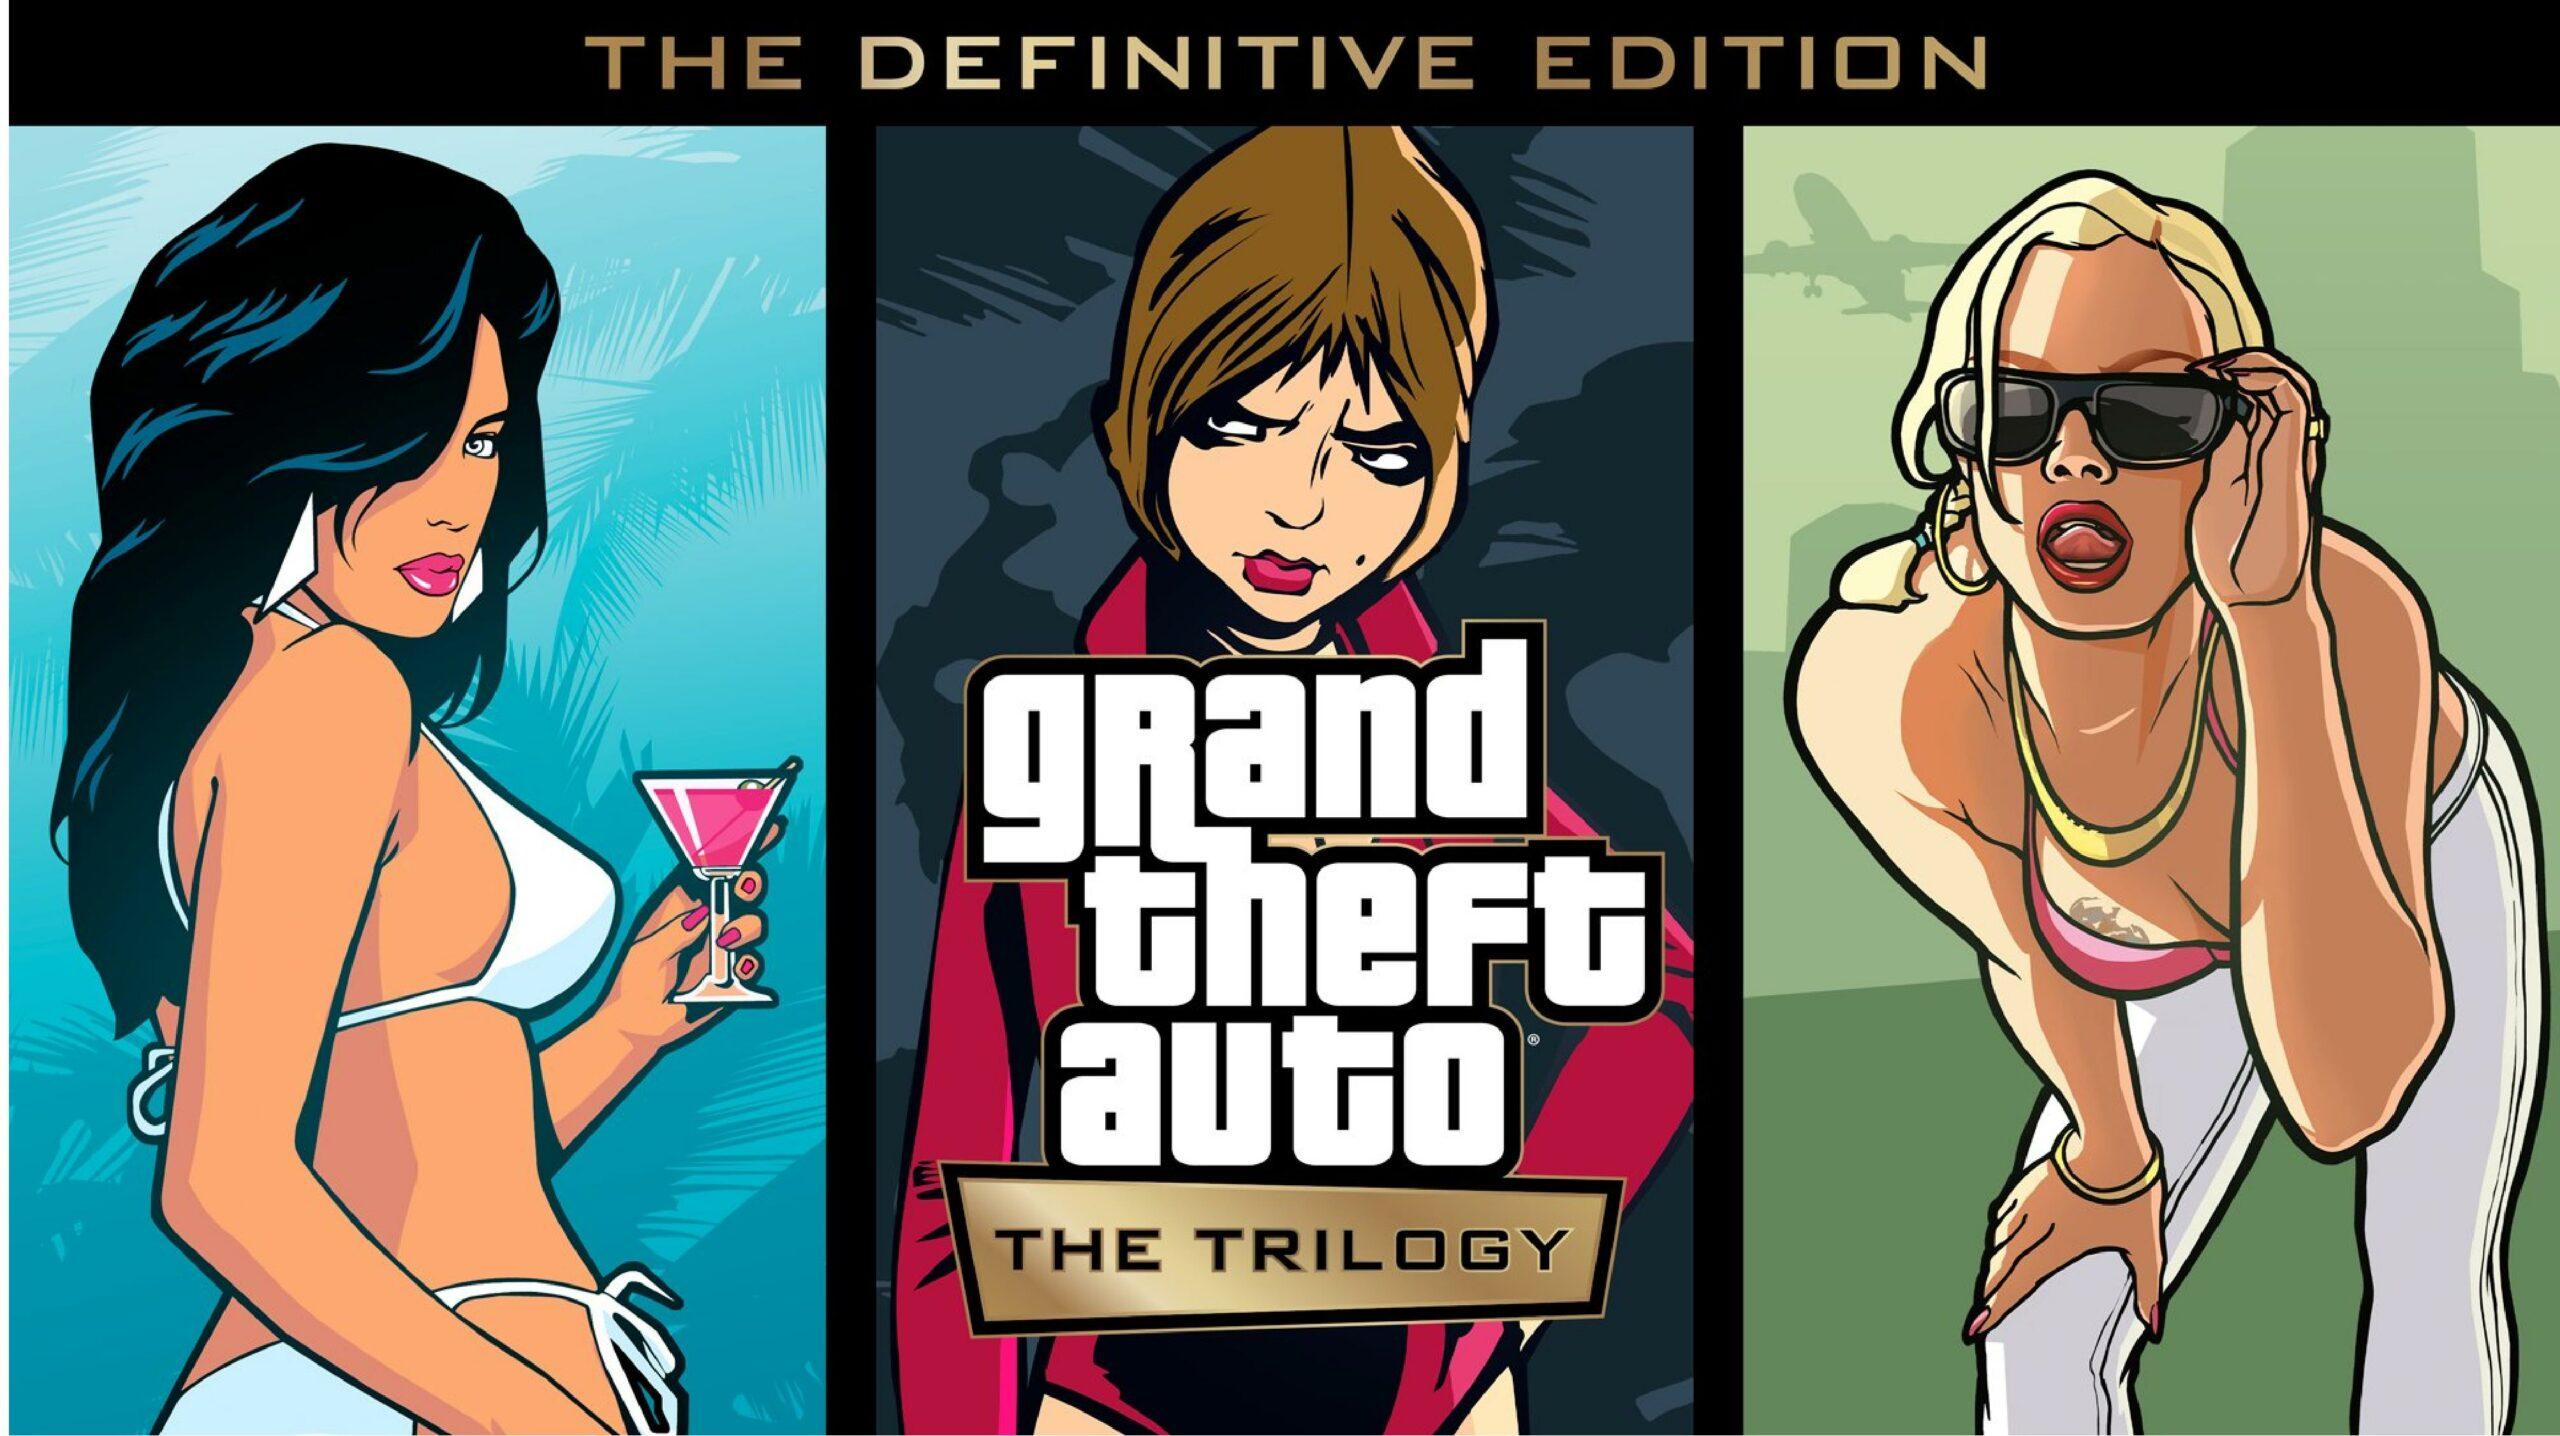 GTA The Trilogy - The Definitive Edition podrían costar $70, según un minorista, GamersRD